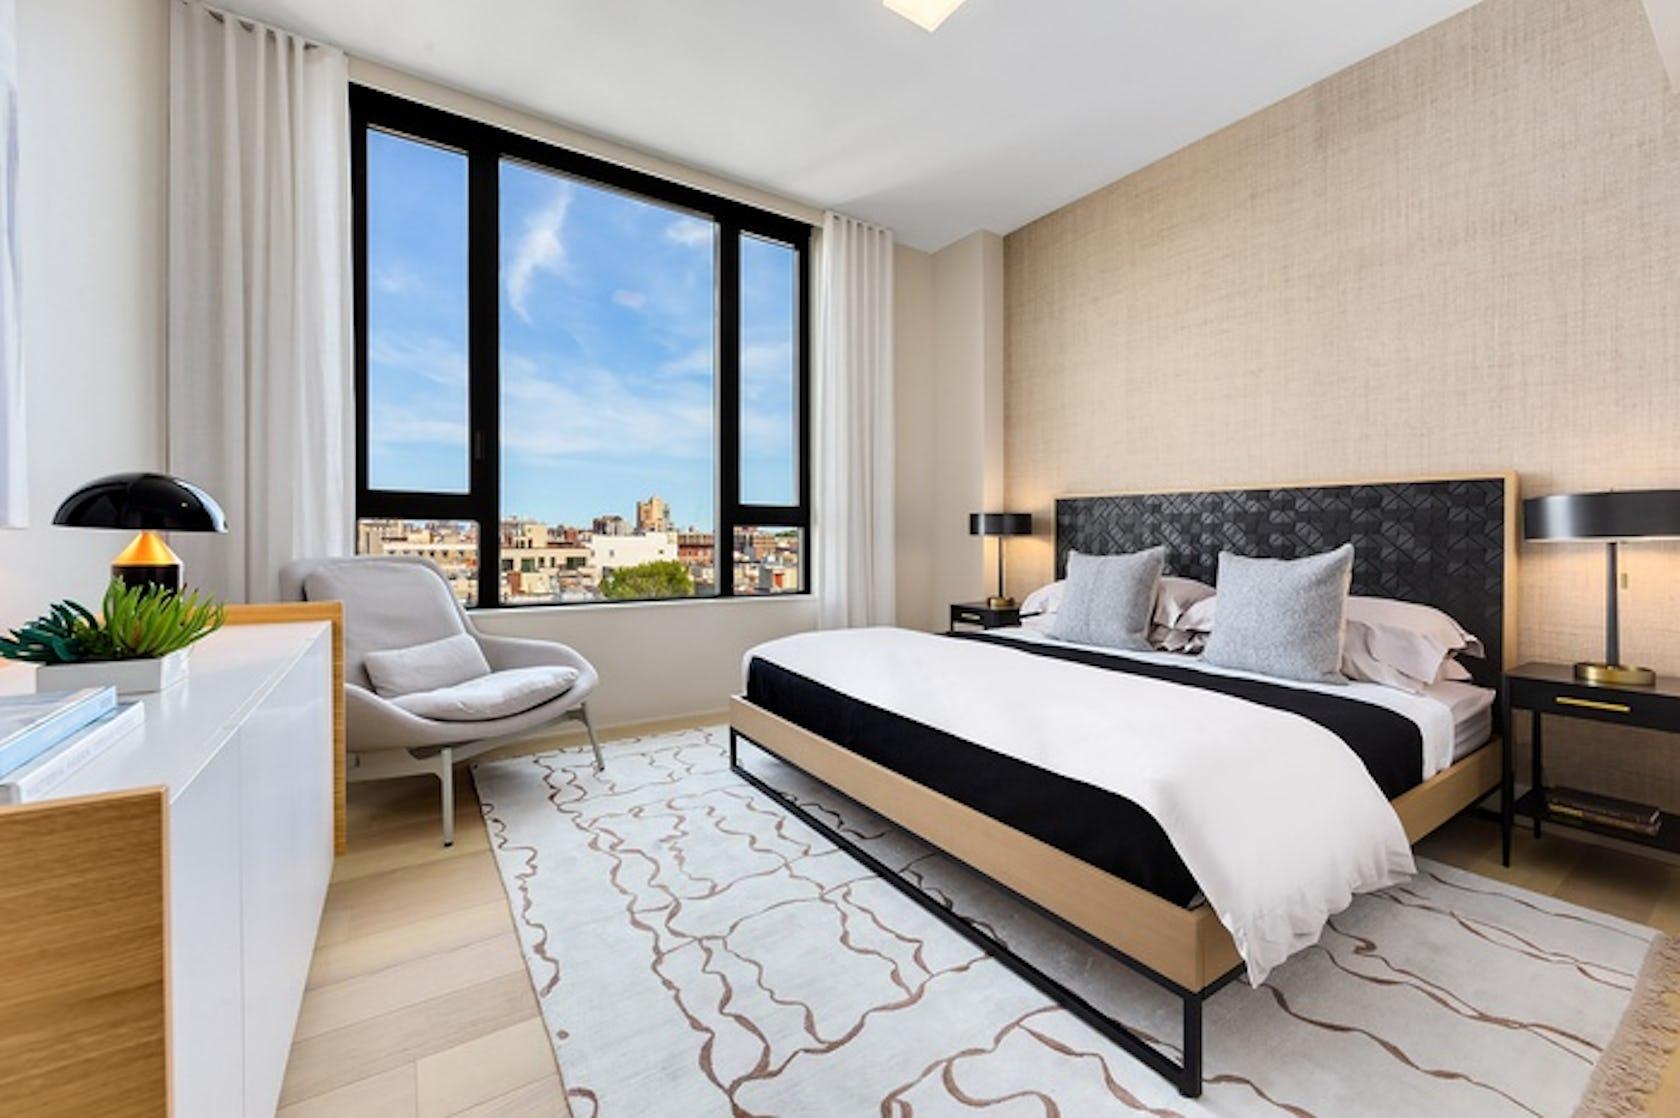 bedroom indoors room rug bed furniture